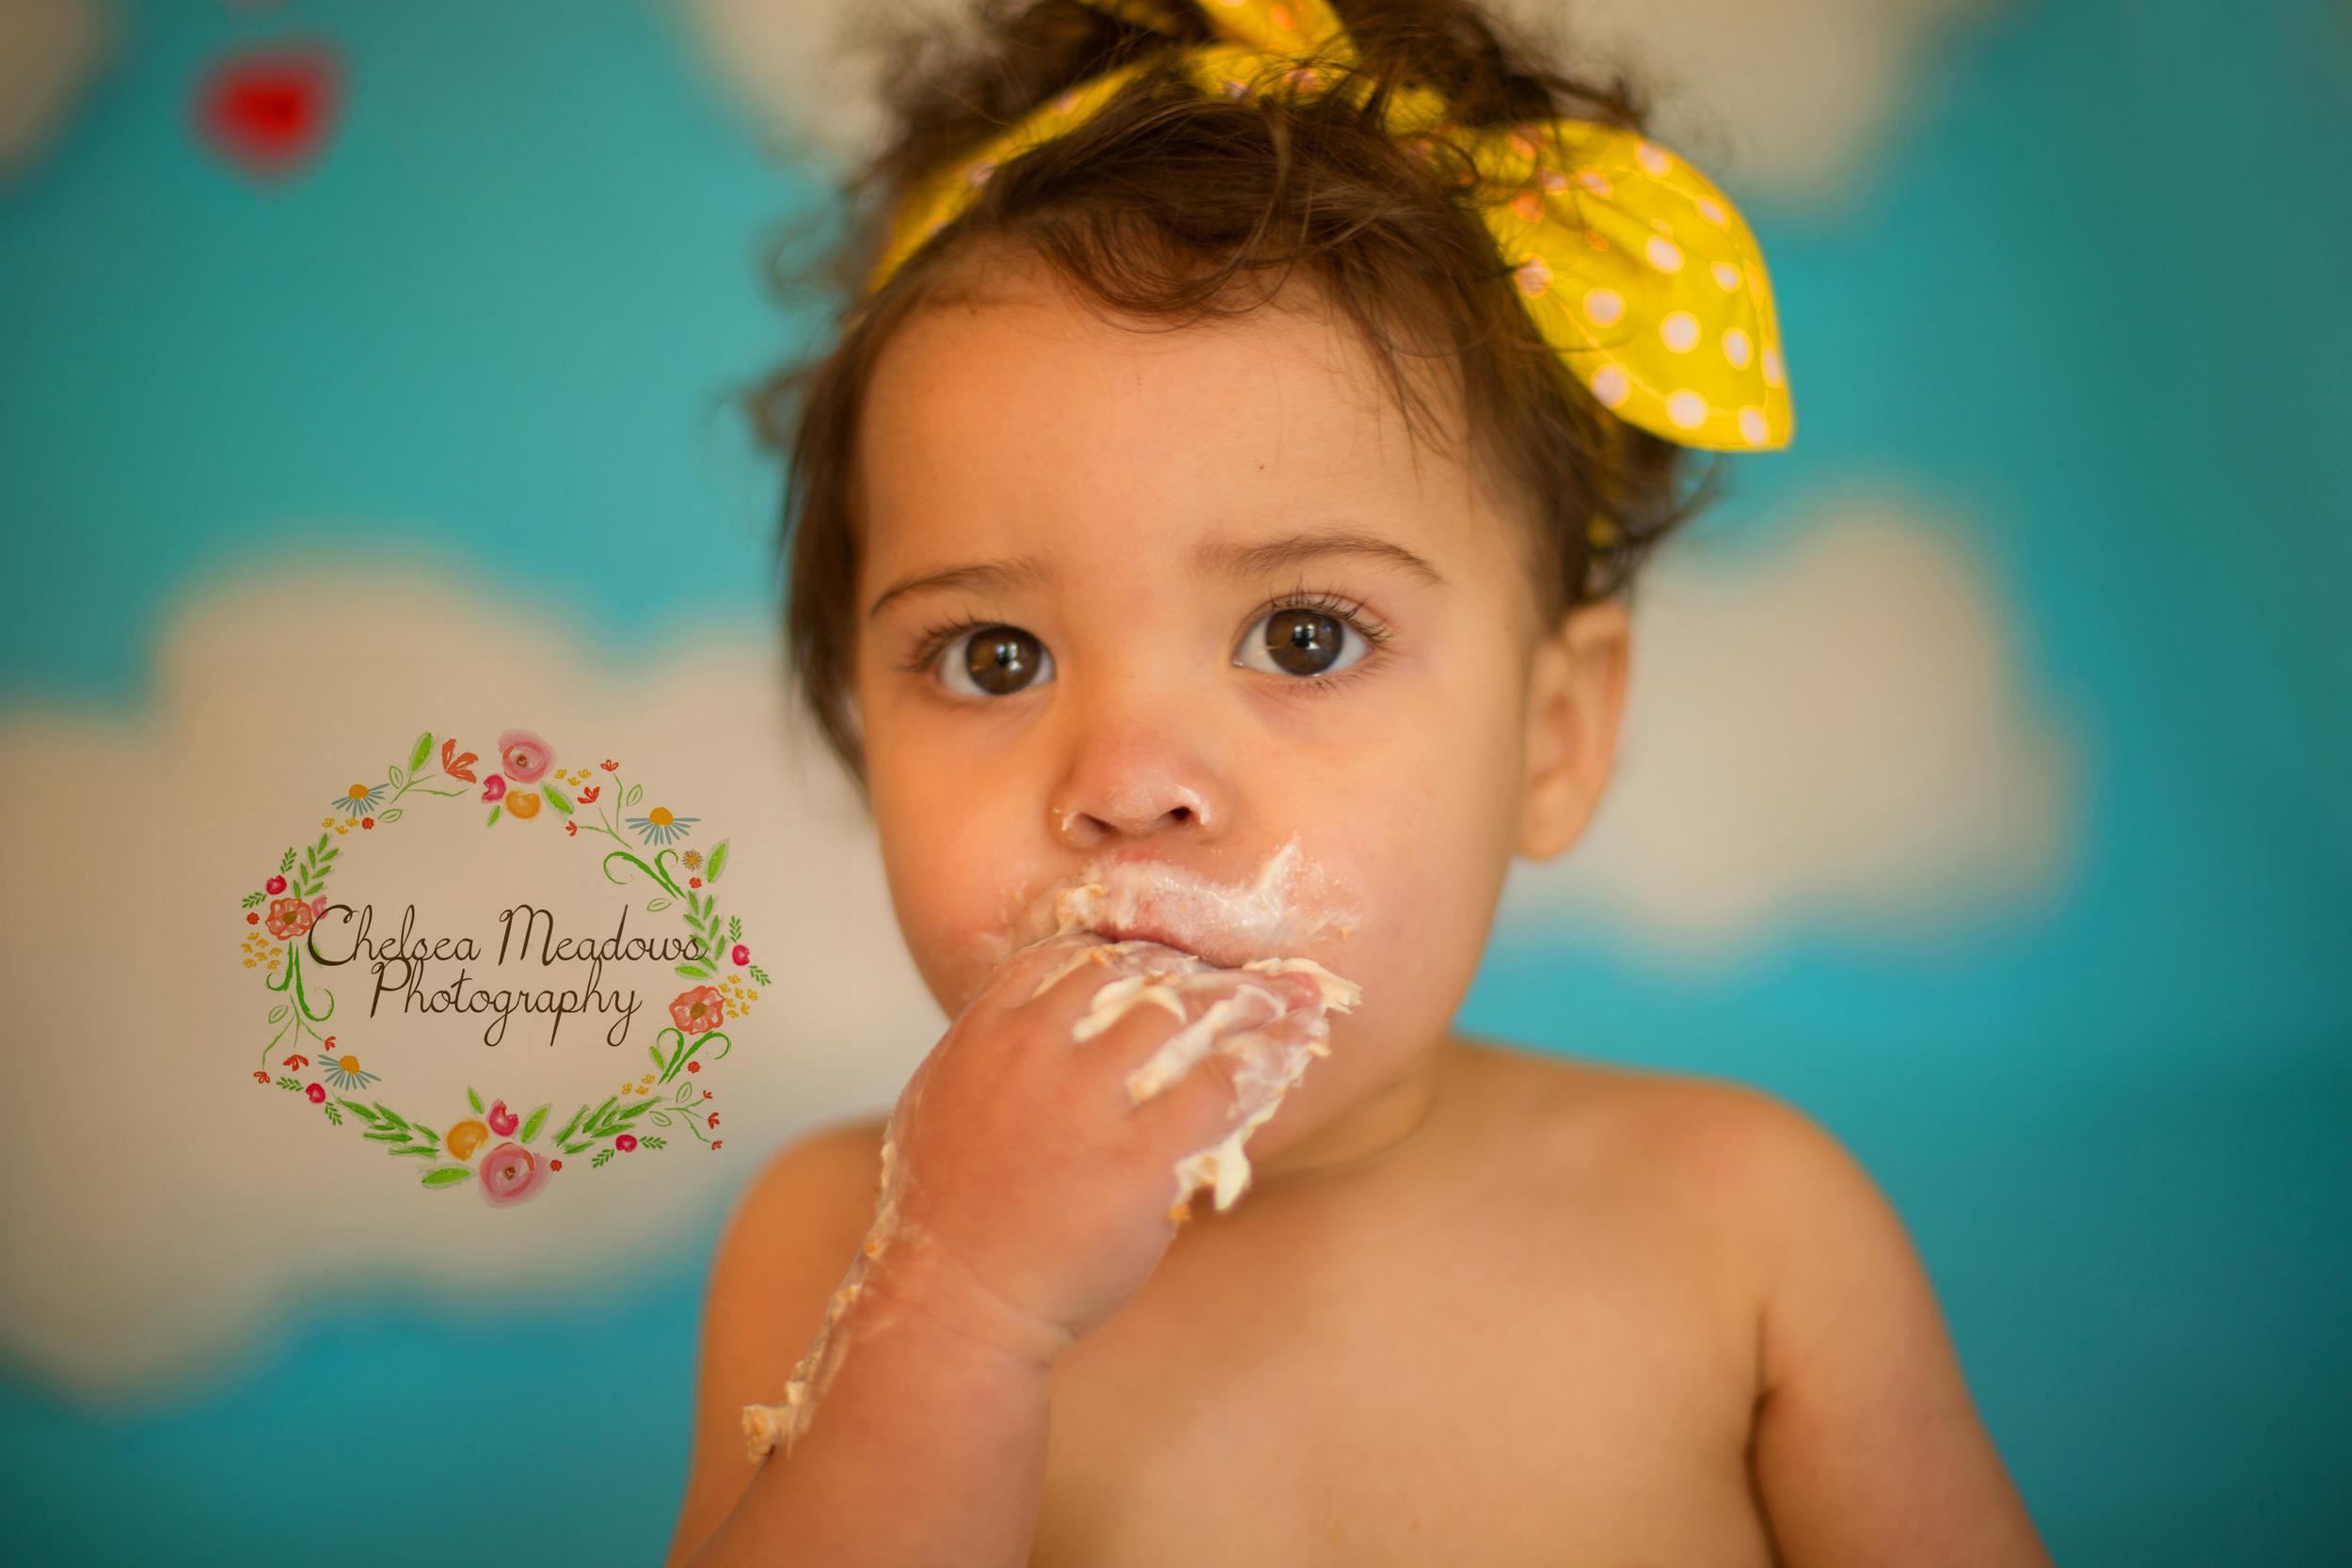 Nardi Family Photos - Chelsea Meadows Photography (24).jpg